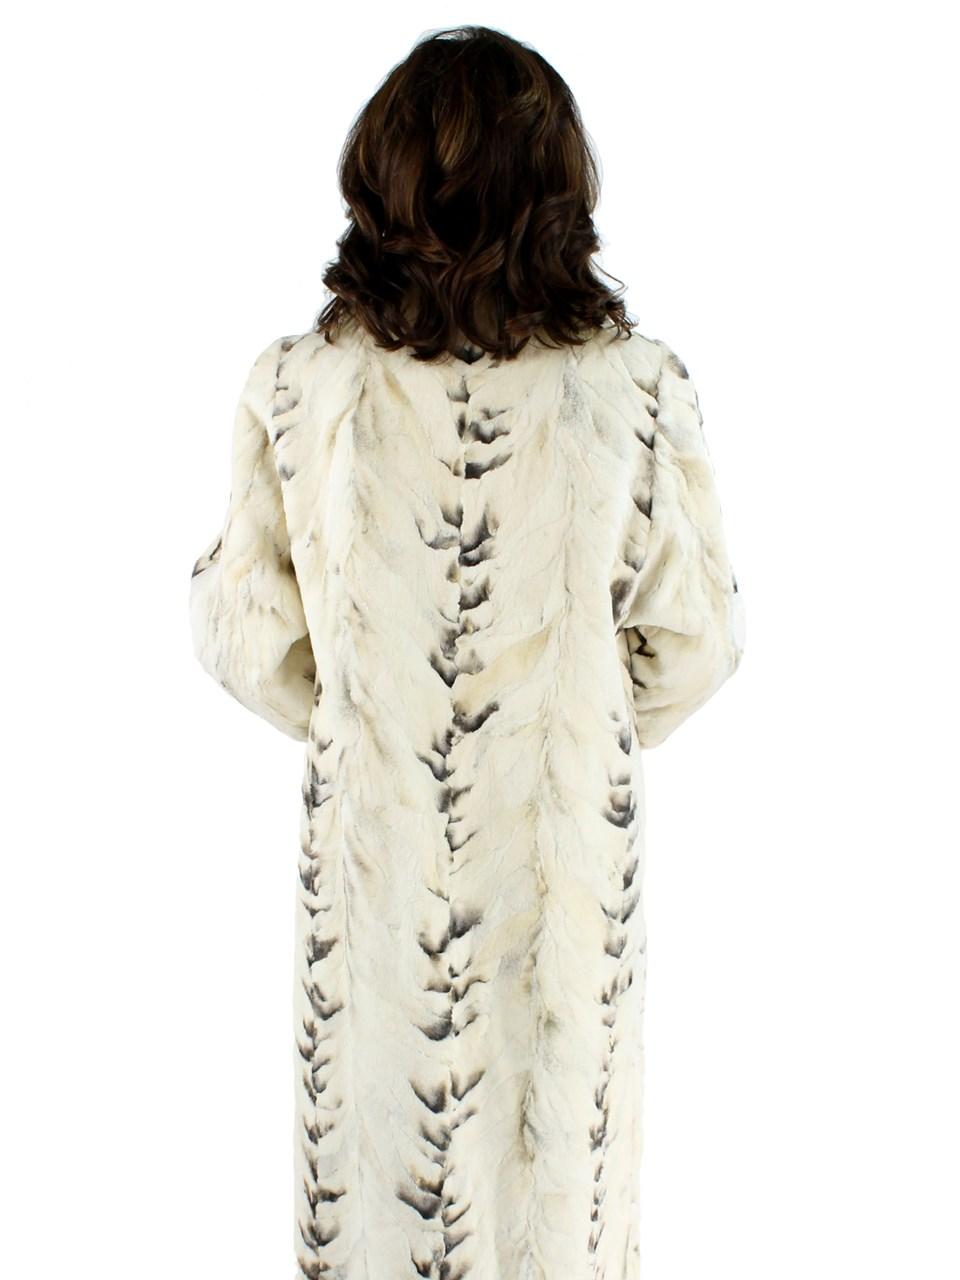 Bleached Sculptured Mink Coat with Finn Raccoon Trim